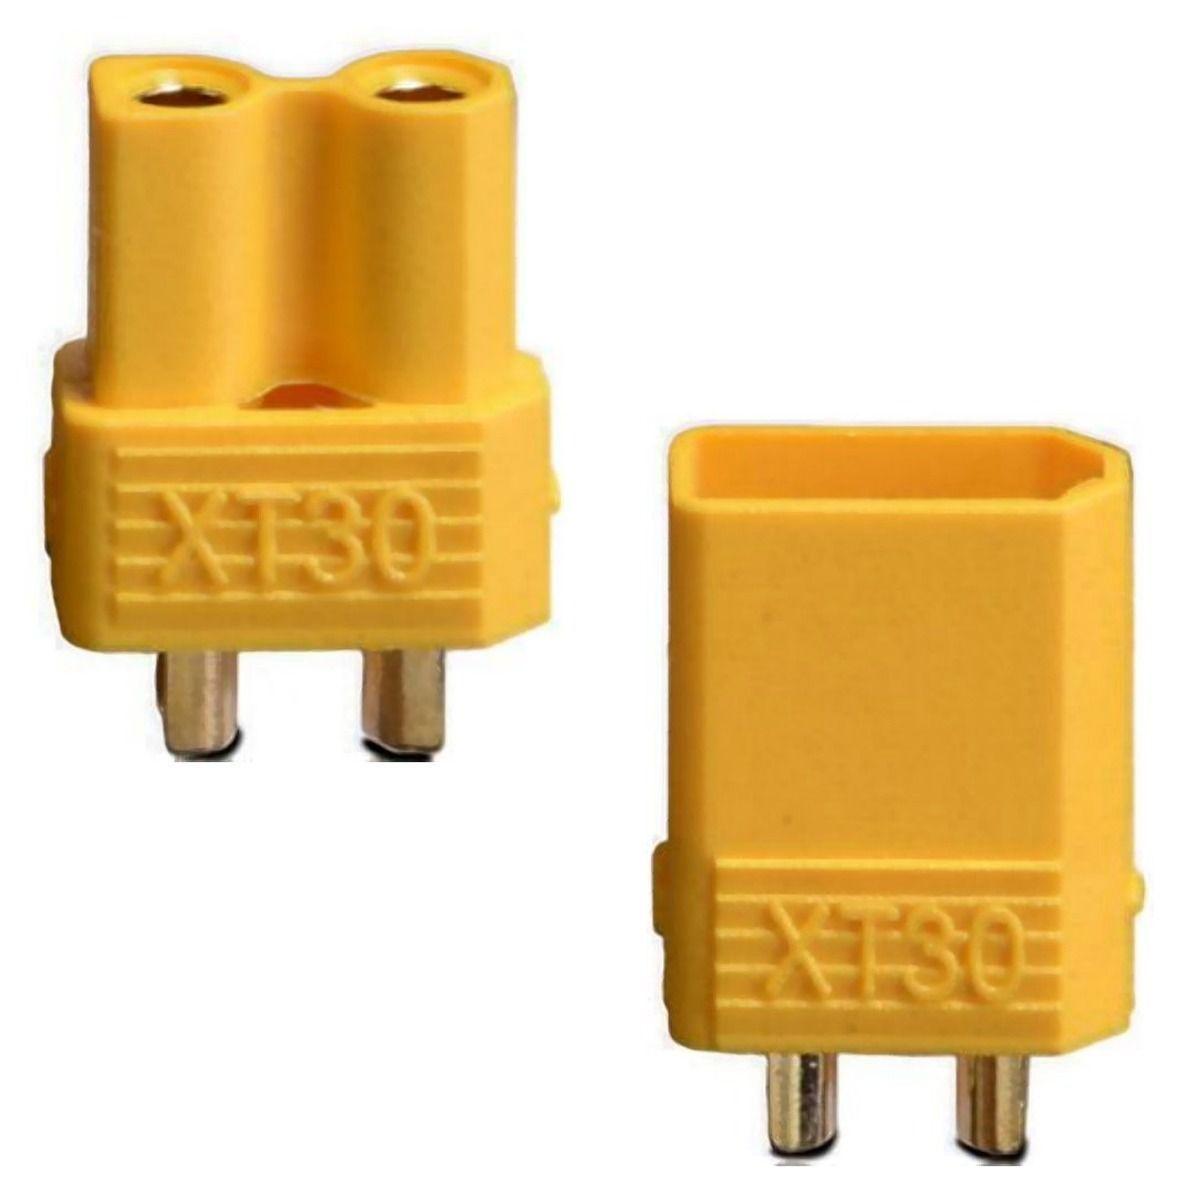 XT30 Connector Set with HeatSrink (2prs)